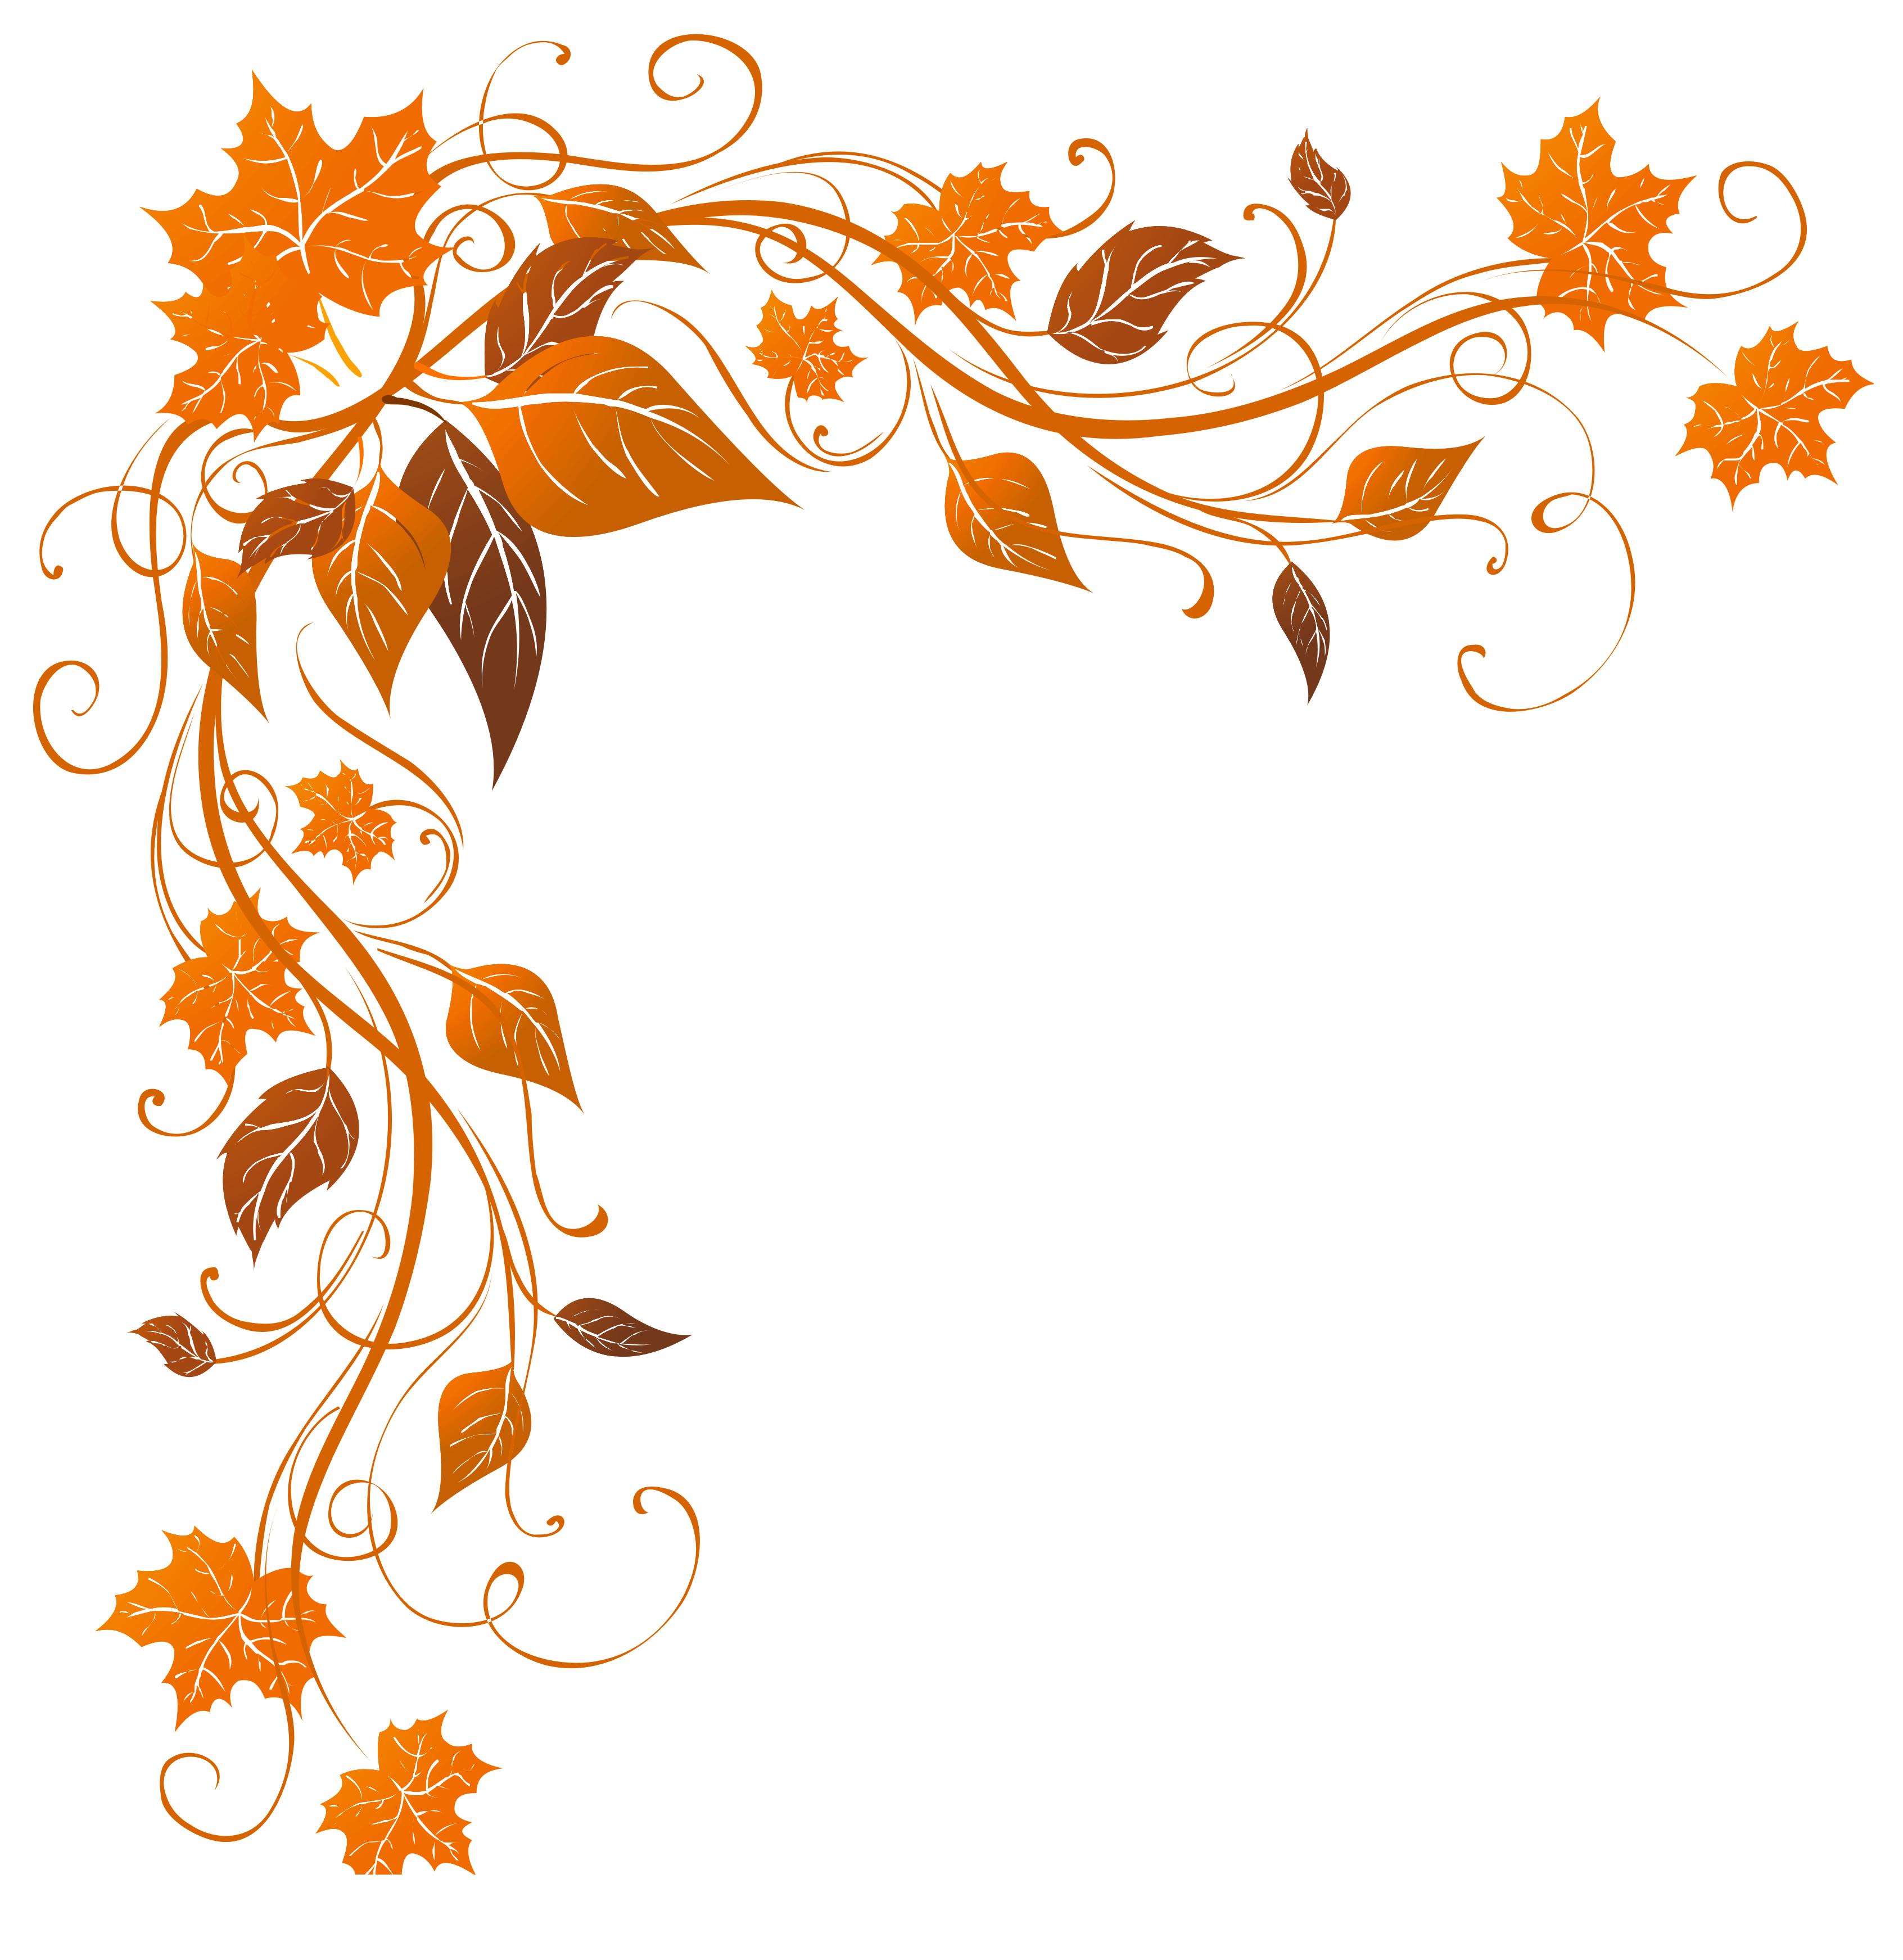 3385x3486 Transparent Autumn Decoration Png Clipart Imageu200b Gallery